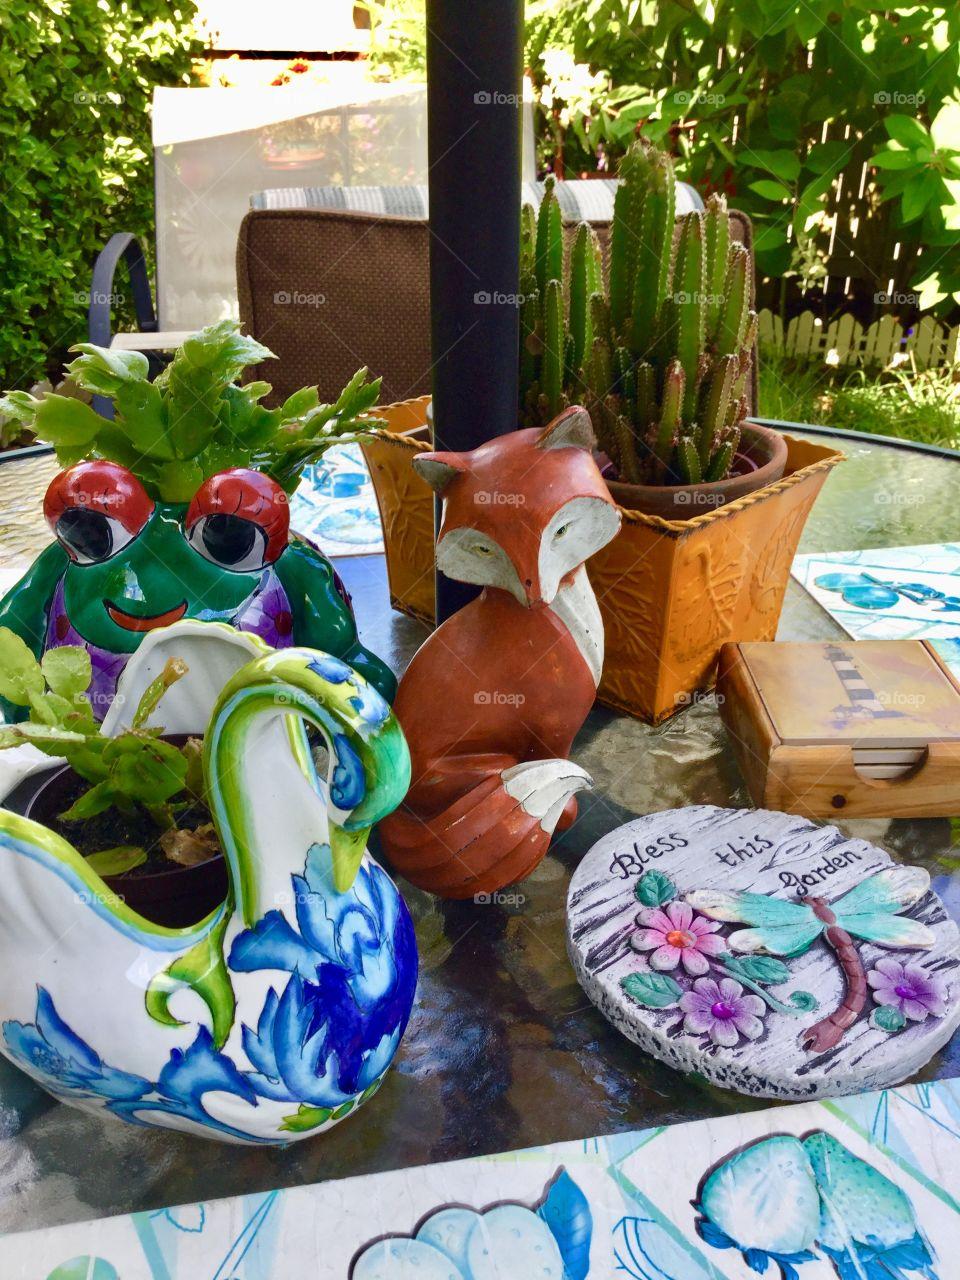 Cute summer garden decorations - family garden